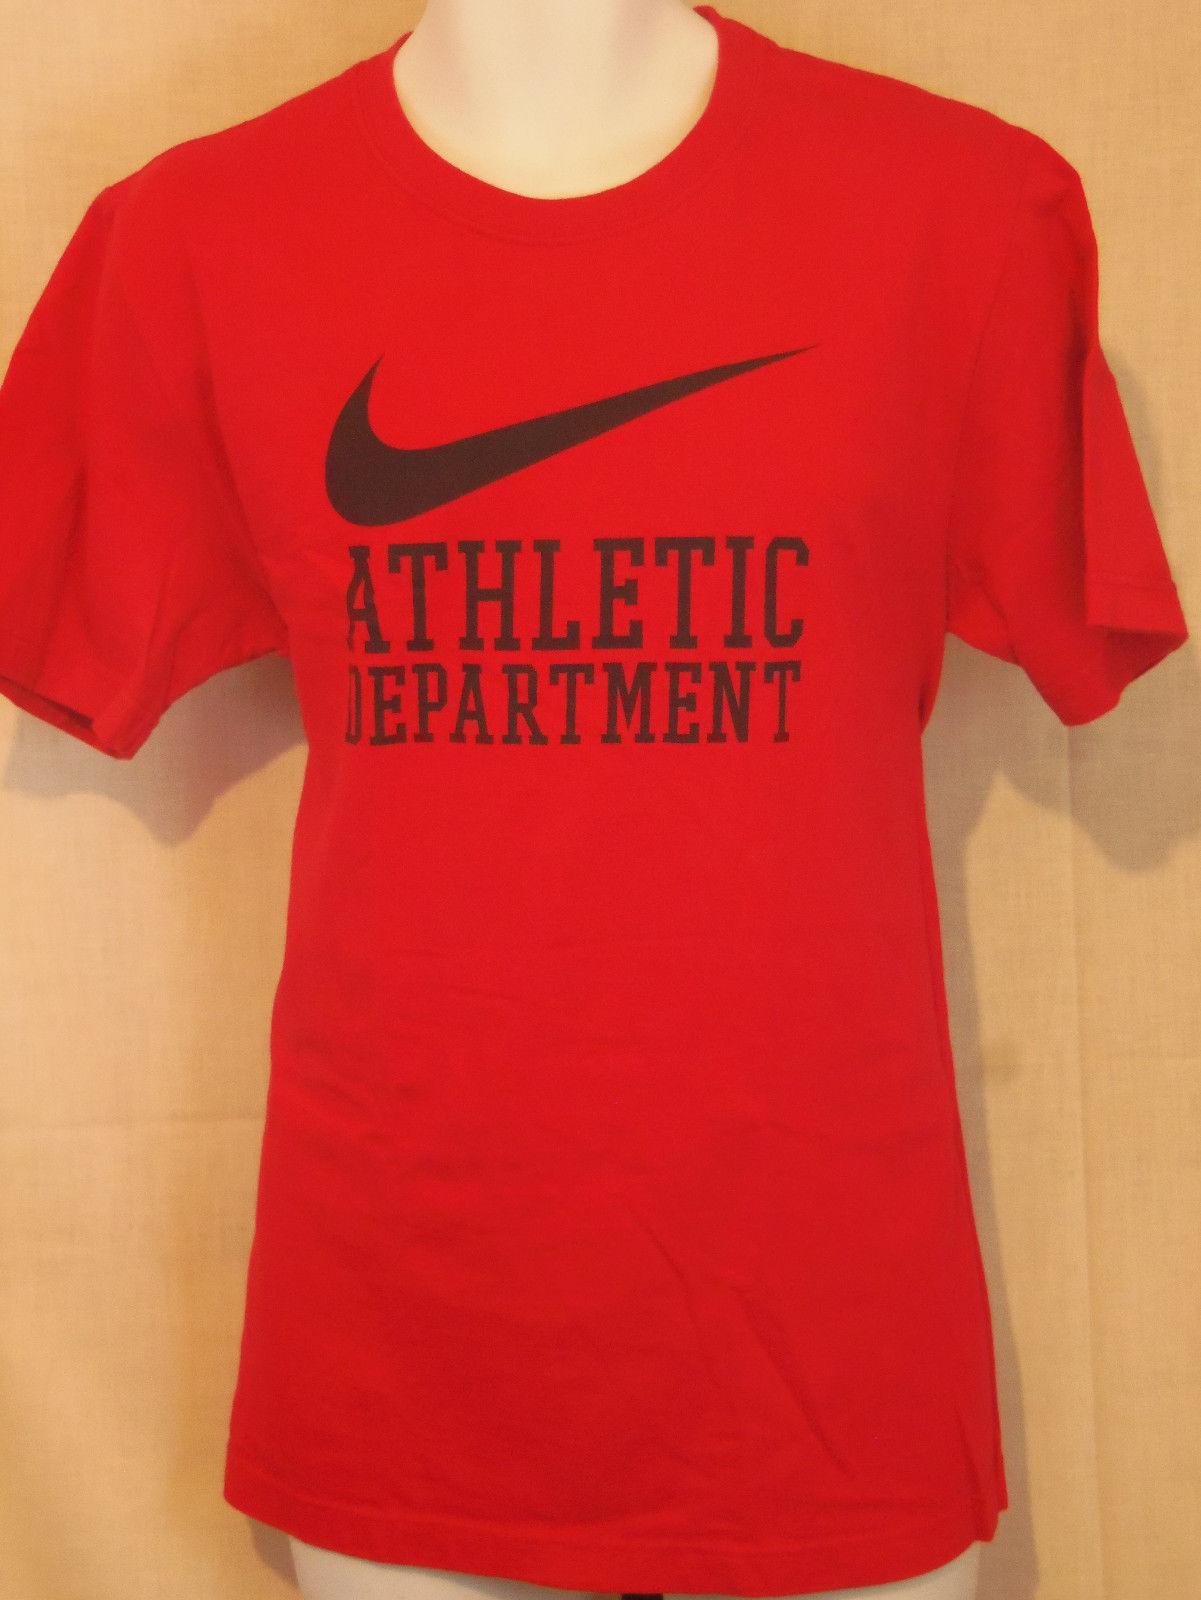 1c9dfc8c nike athletics dept red large L T shirt and 50 similar items. S l1600